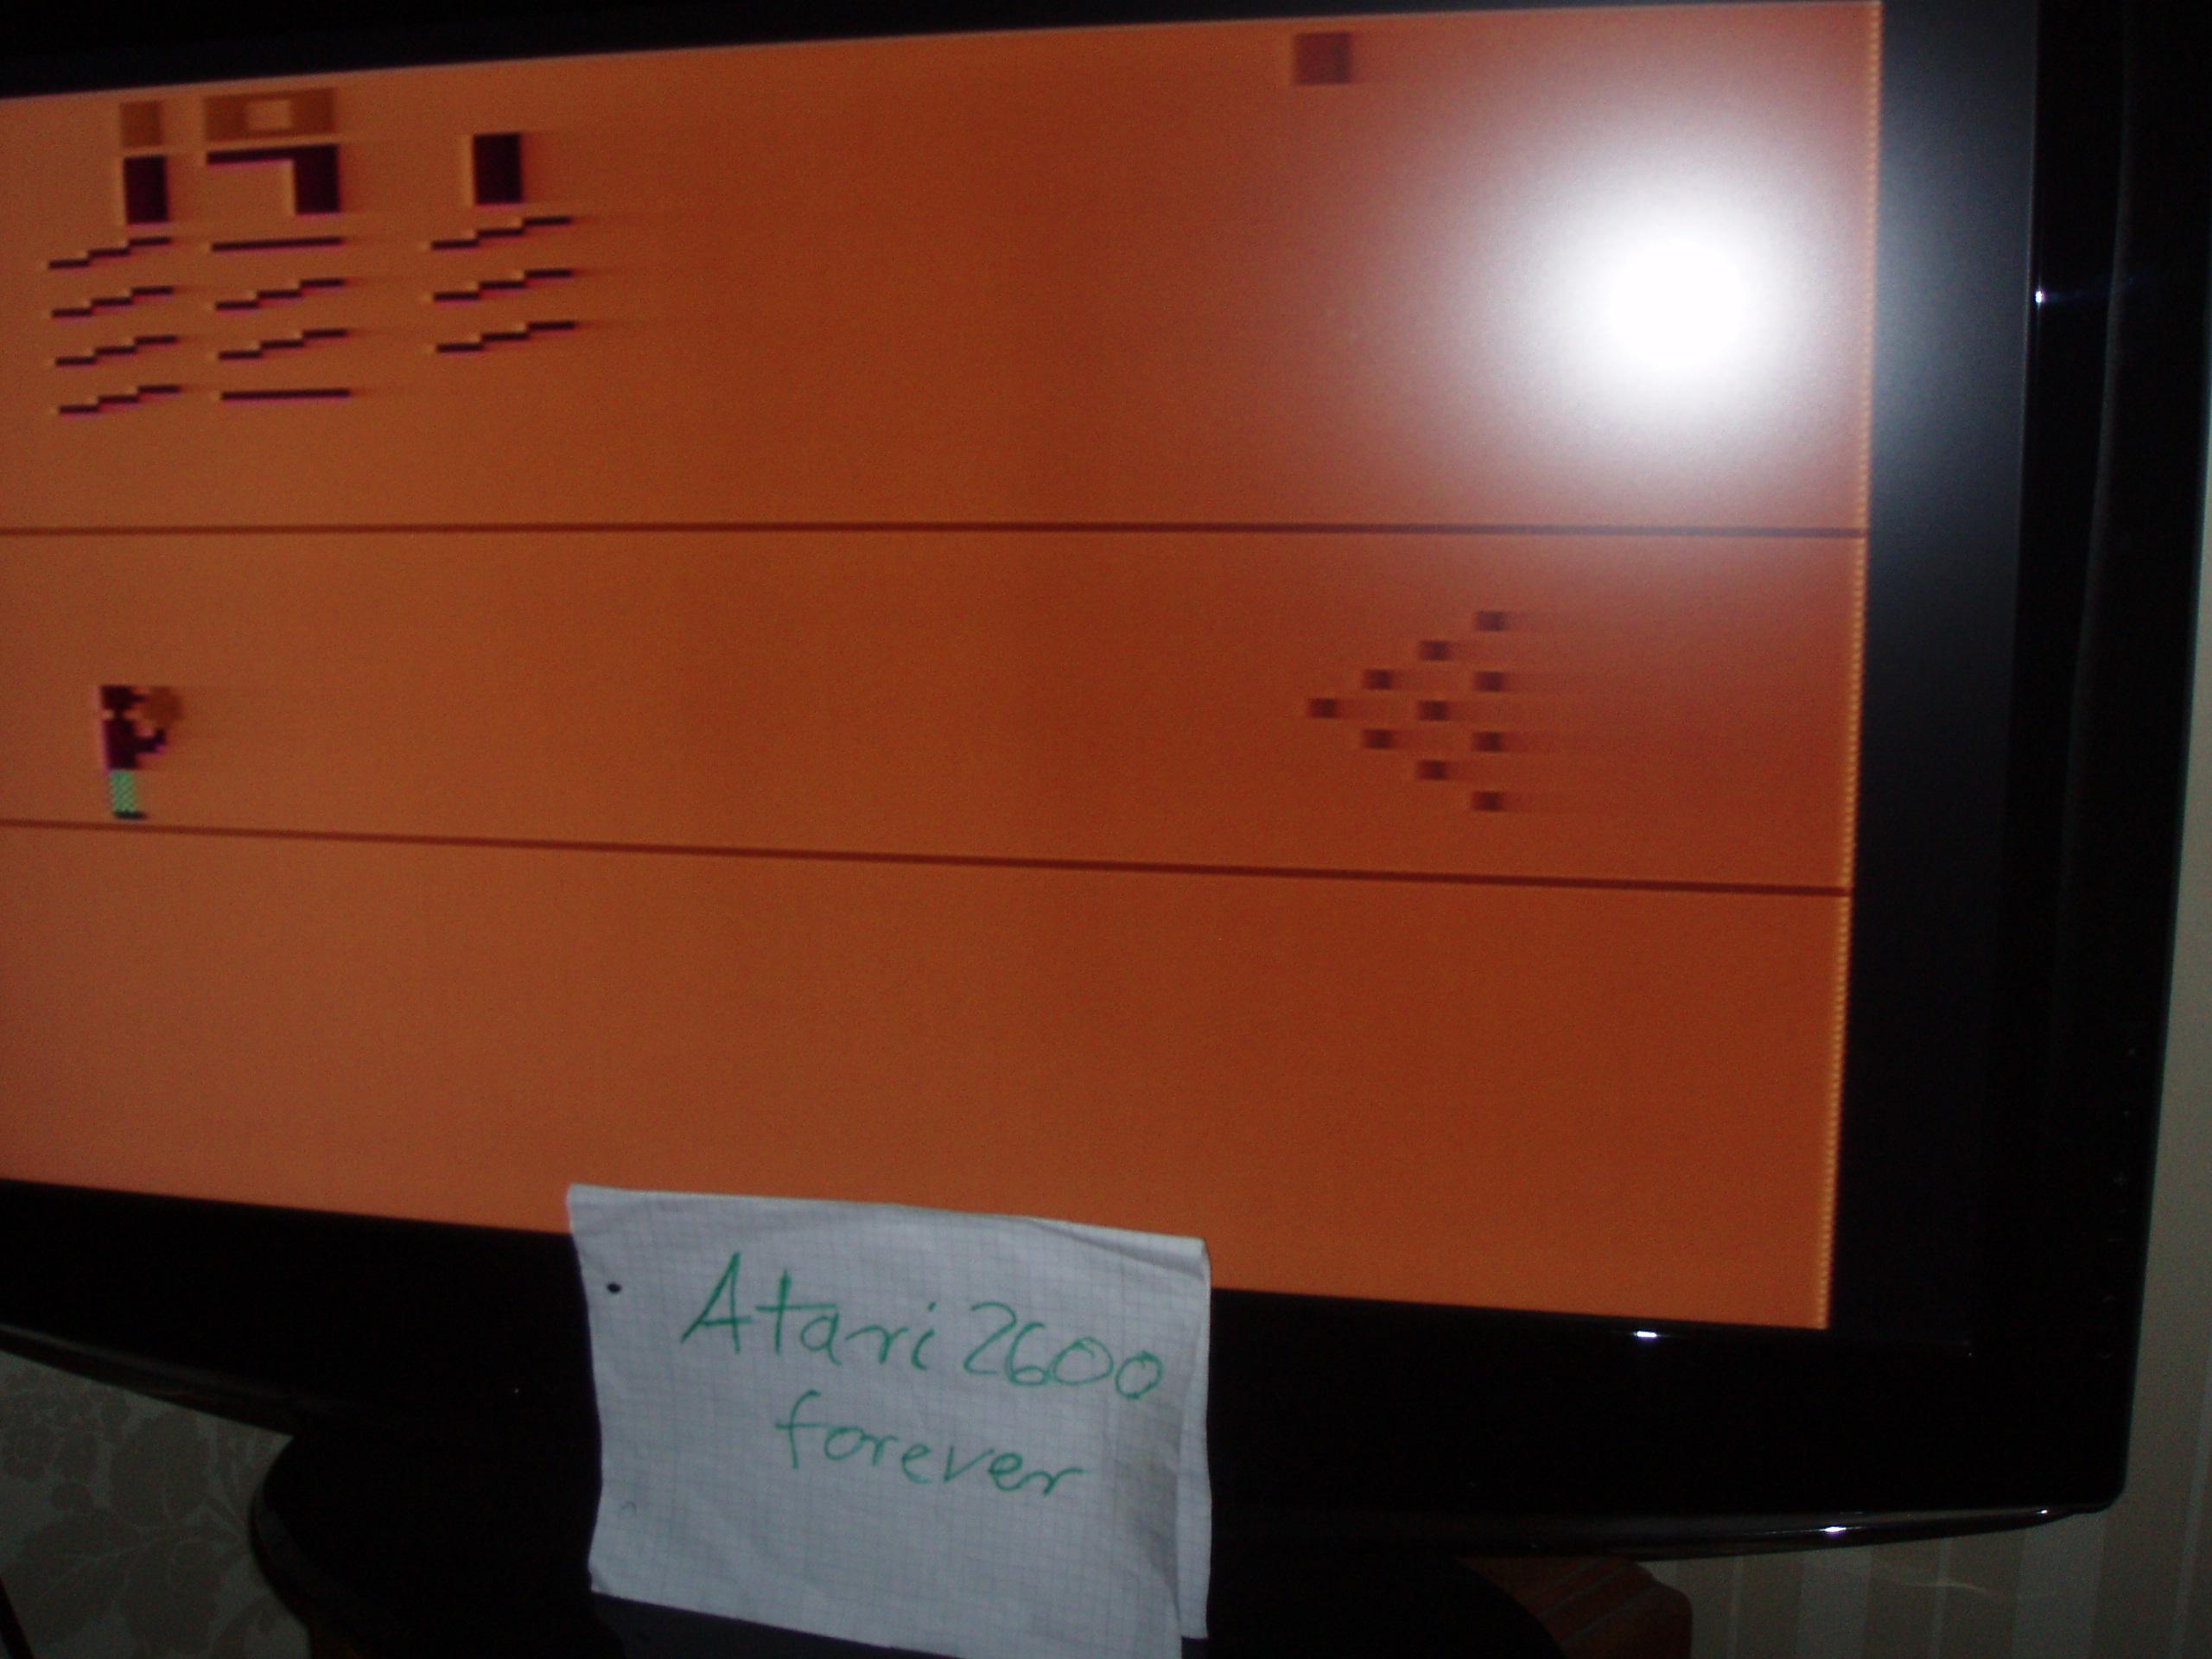 atari2600forever: Bowling (Atari 2600 Novice/B) 171 points on 2017-03-08 04:08:27